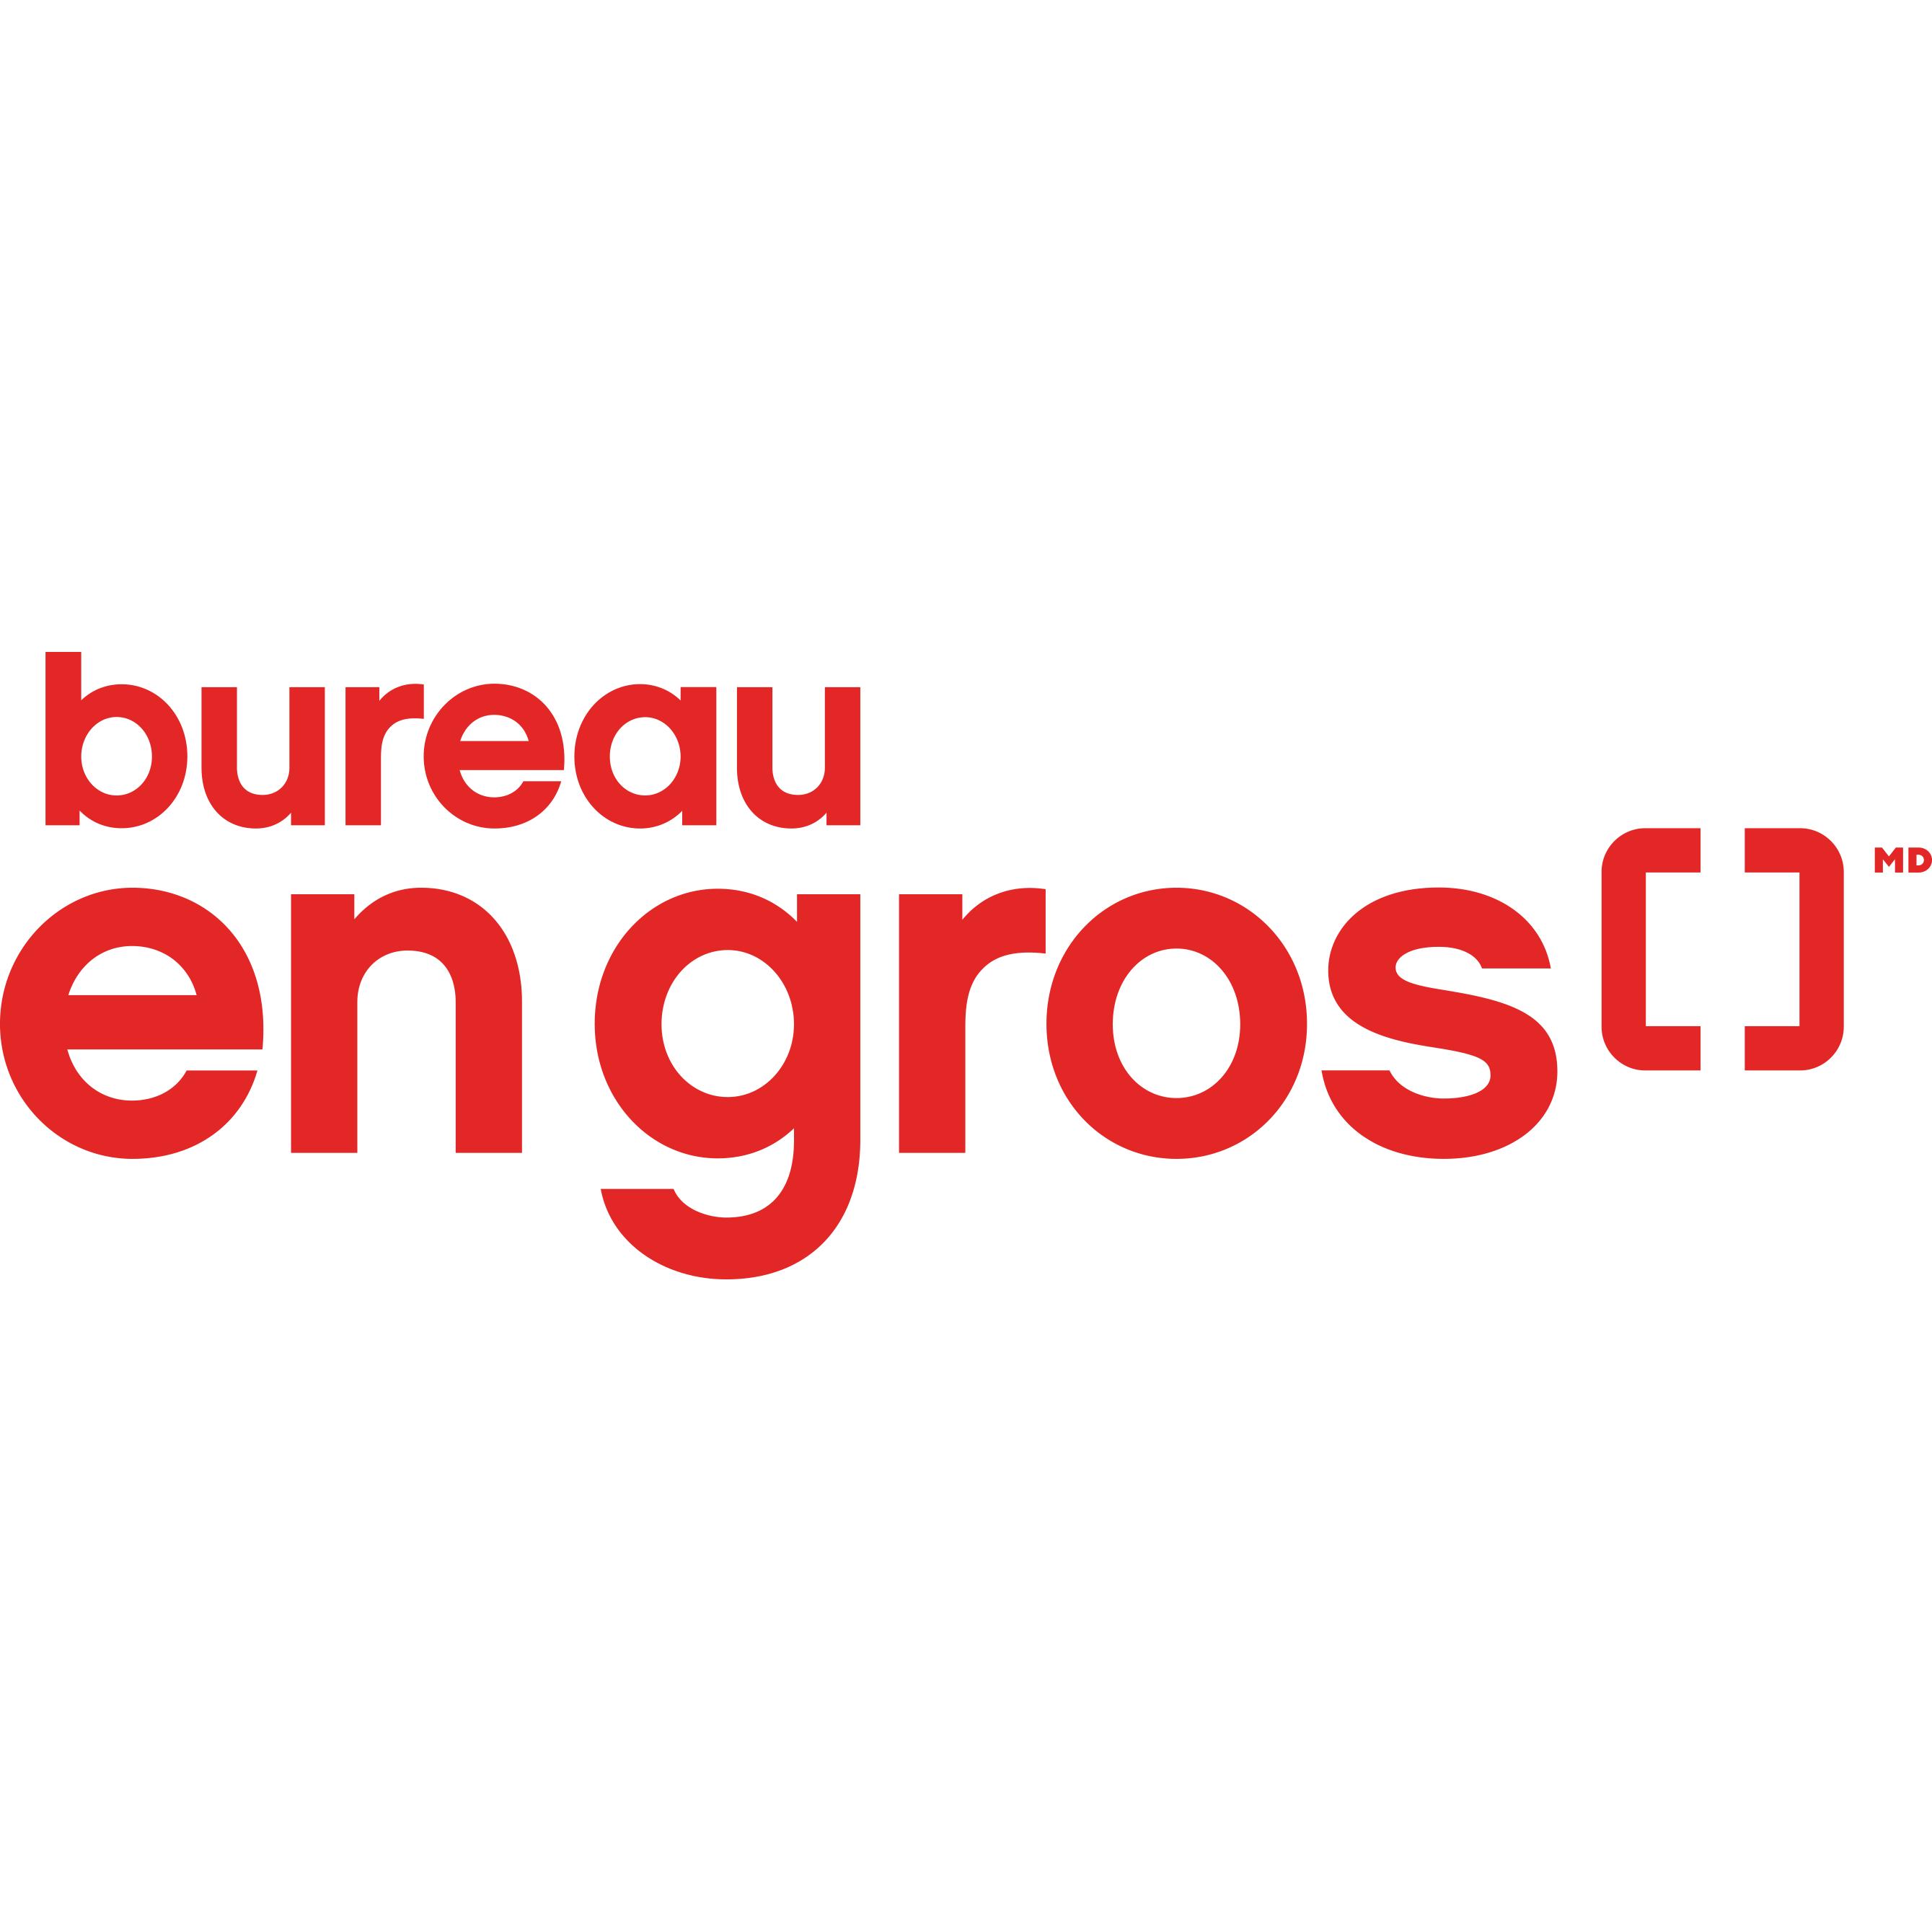 Bureau en Gros Lasalle